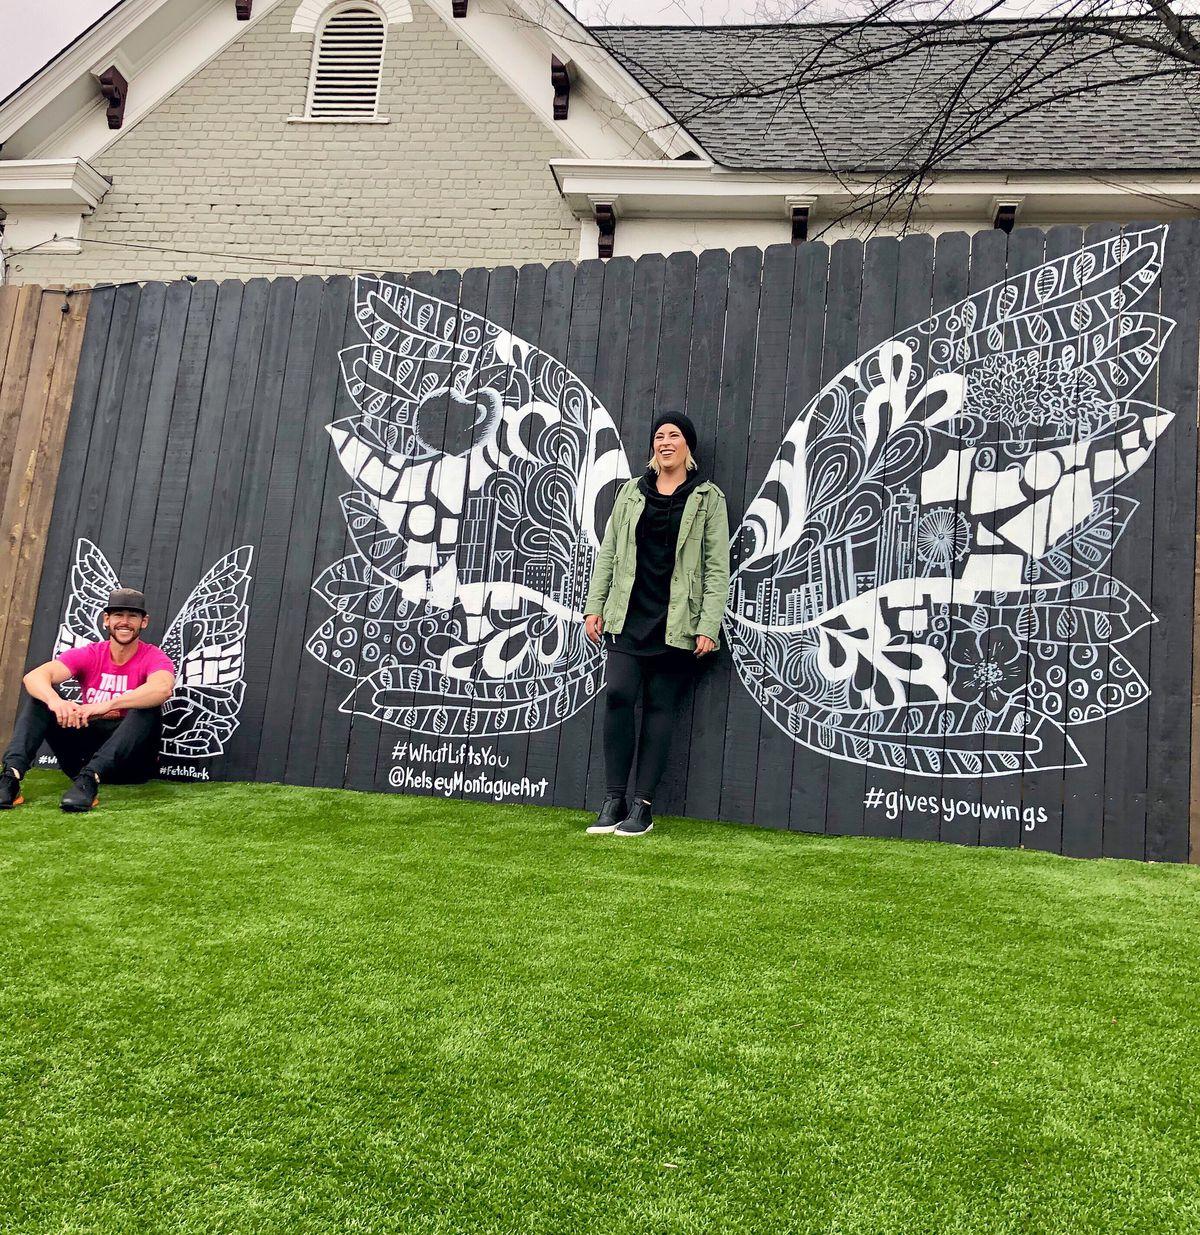 Fetch owner Stephen Ochs and artist Kelsey Montague